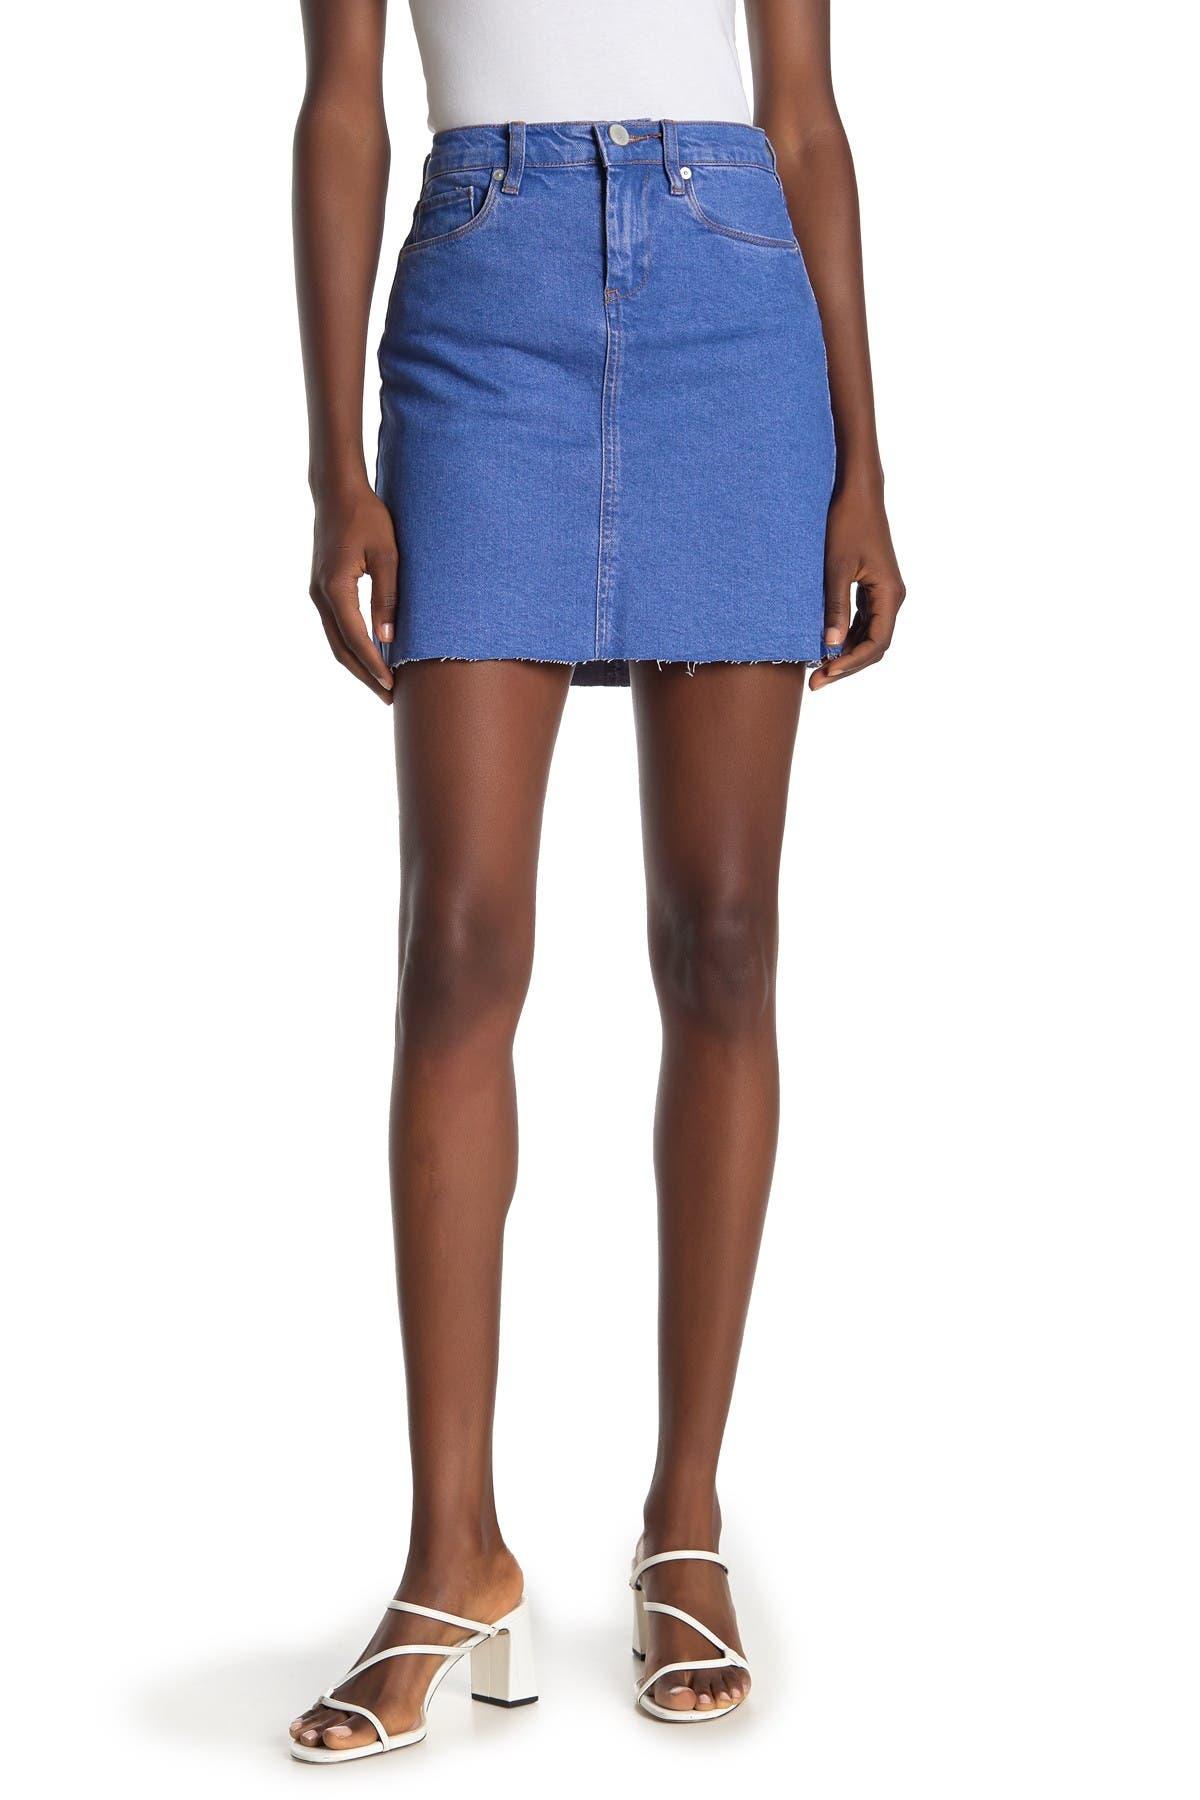 Image of BLANKNYC Denim High Rise Denim Cutoff Mini Skirt